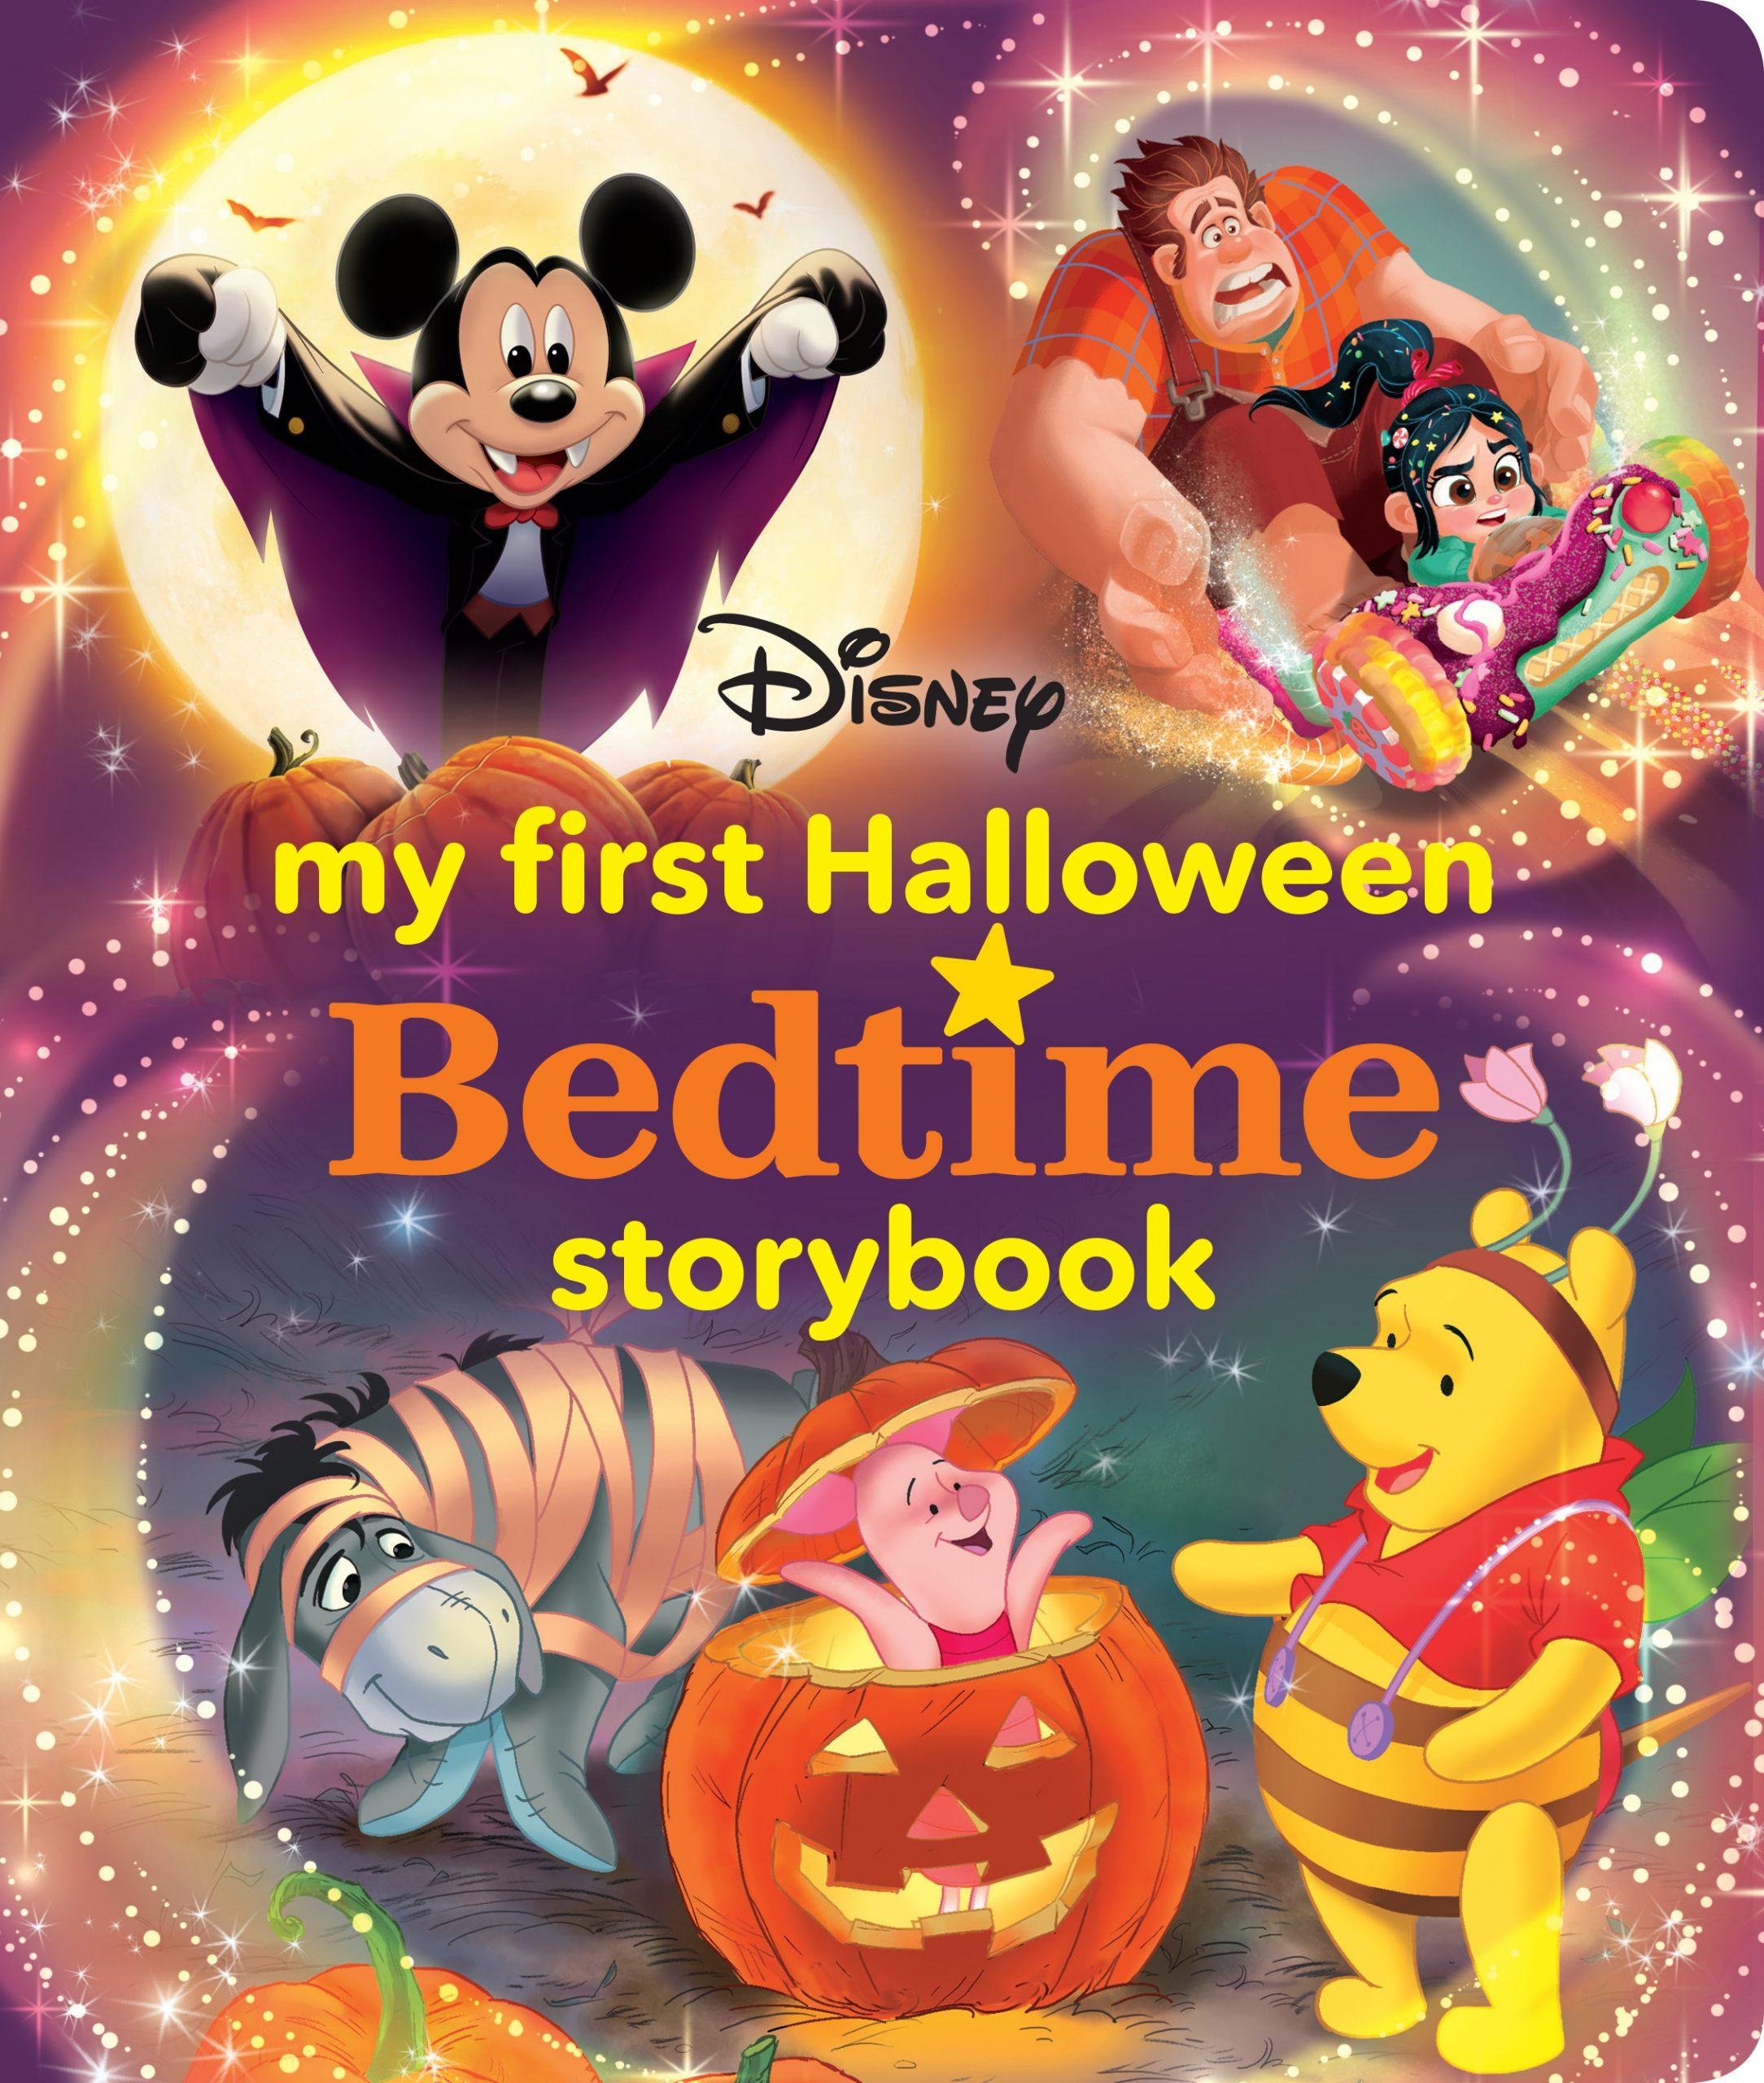 Disney Halloween Pictures.My First Halloween Bedtime Storybook Disney Books Disney Publishing Worldwide